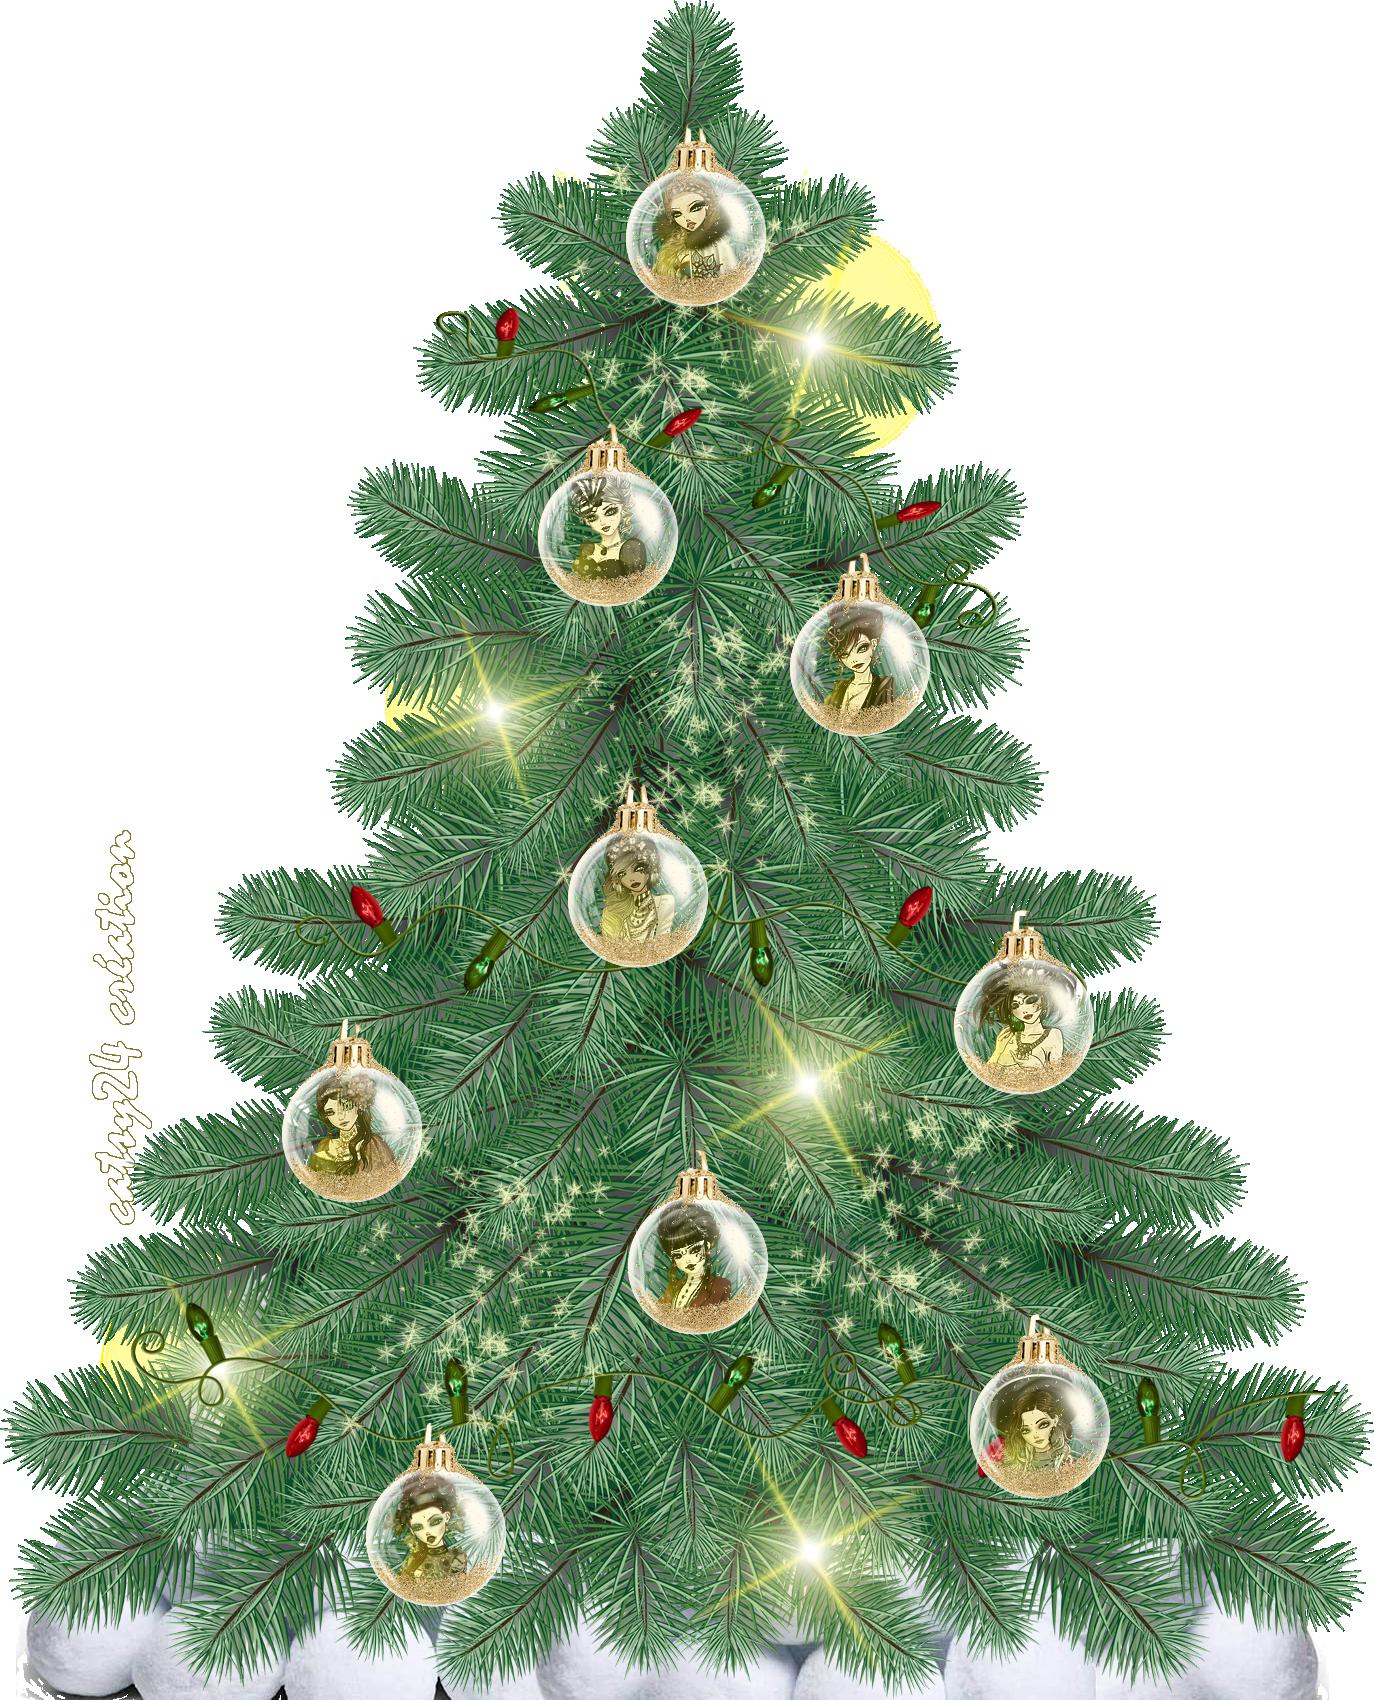 cadeau aux filanteuses: Okazou, Peste74, Mysti251 et Lilimalili, Threnody, Tootoon et Jadely, Fofolle974 et Neyaa44  713024arbredenoelbimbodeltoilefilante